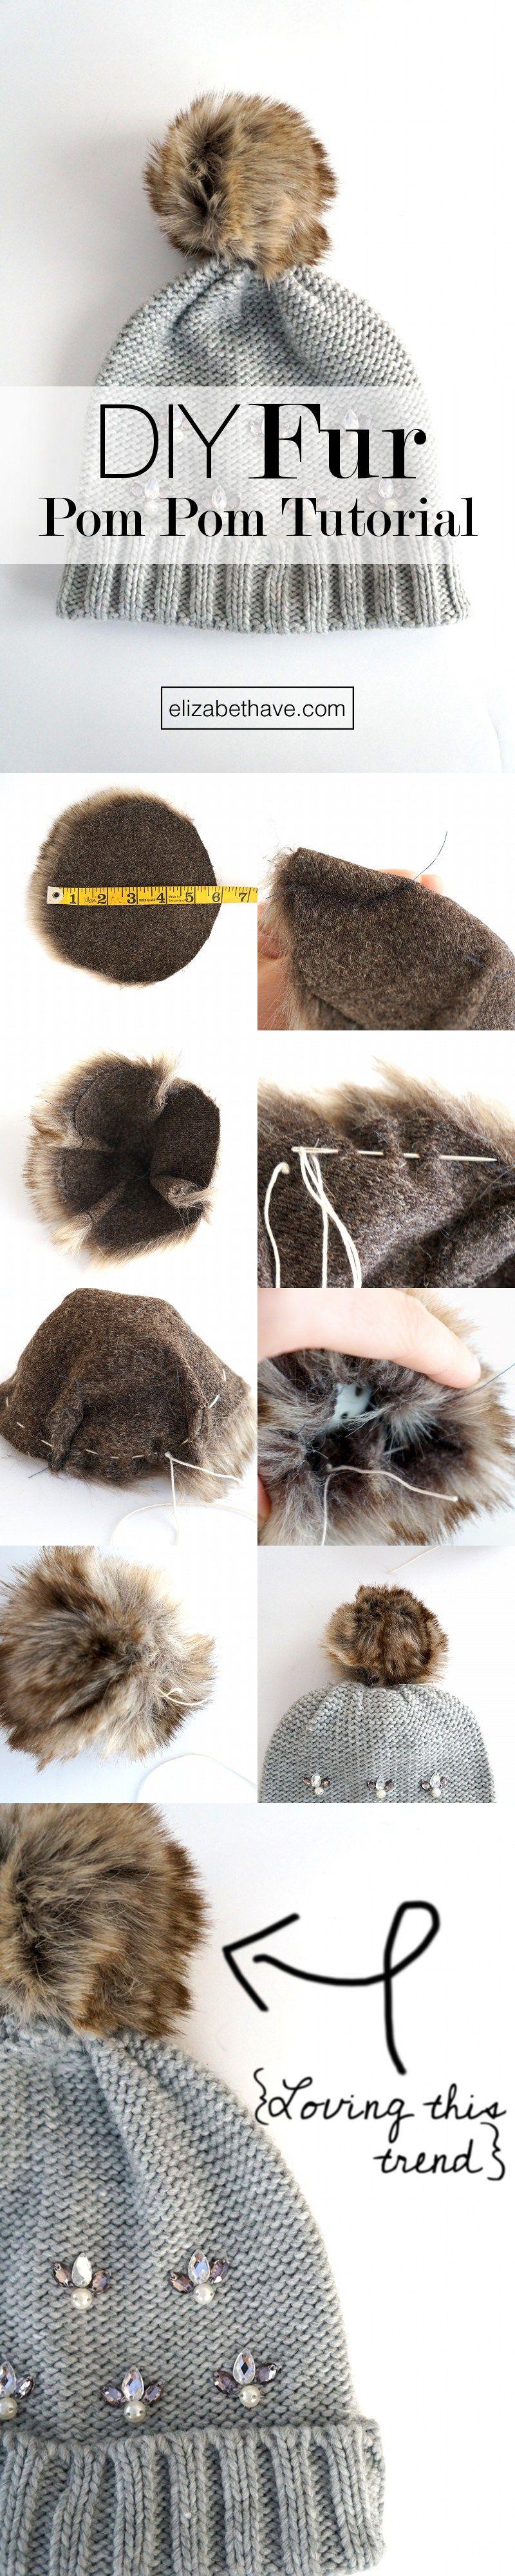 f2dcc97ec98 DIY Fur Pom Pom Tutorial